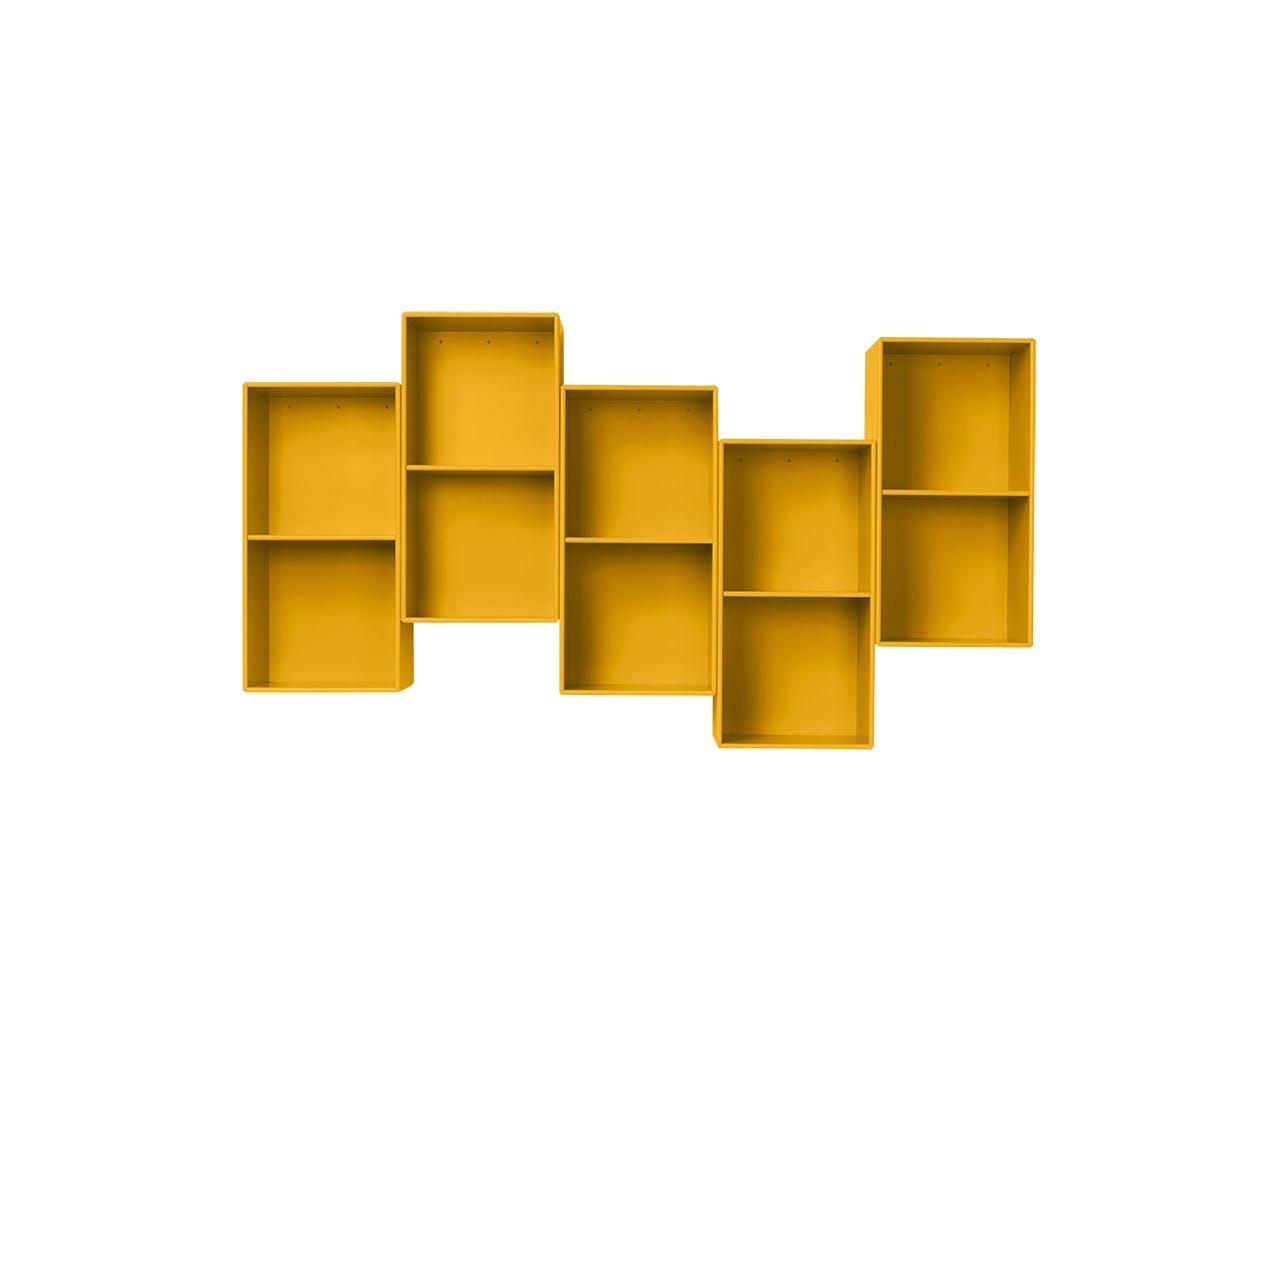 Montana displayhylde i gul